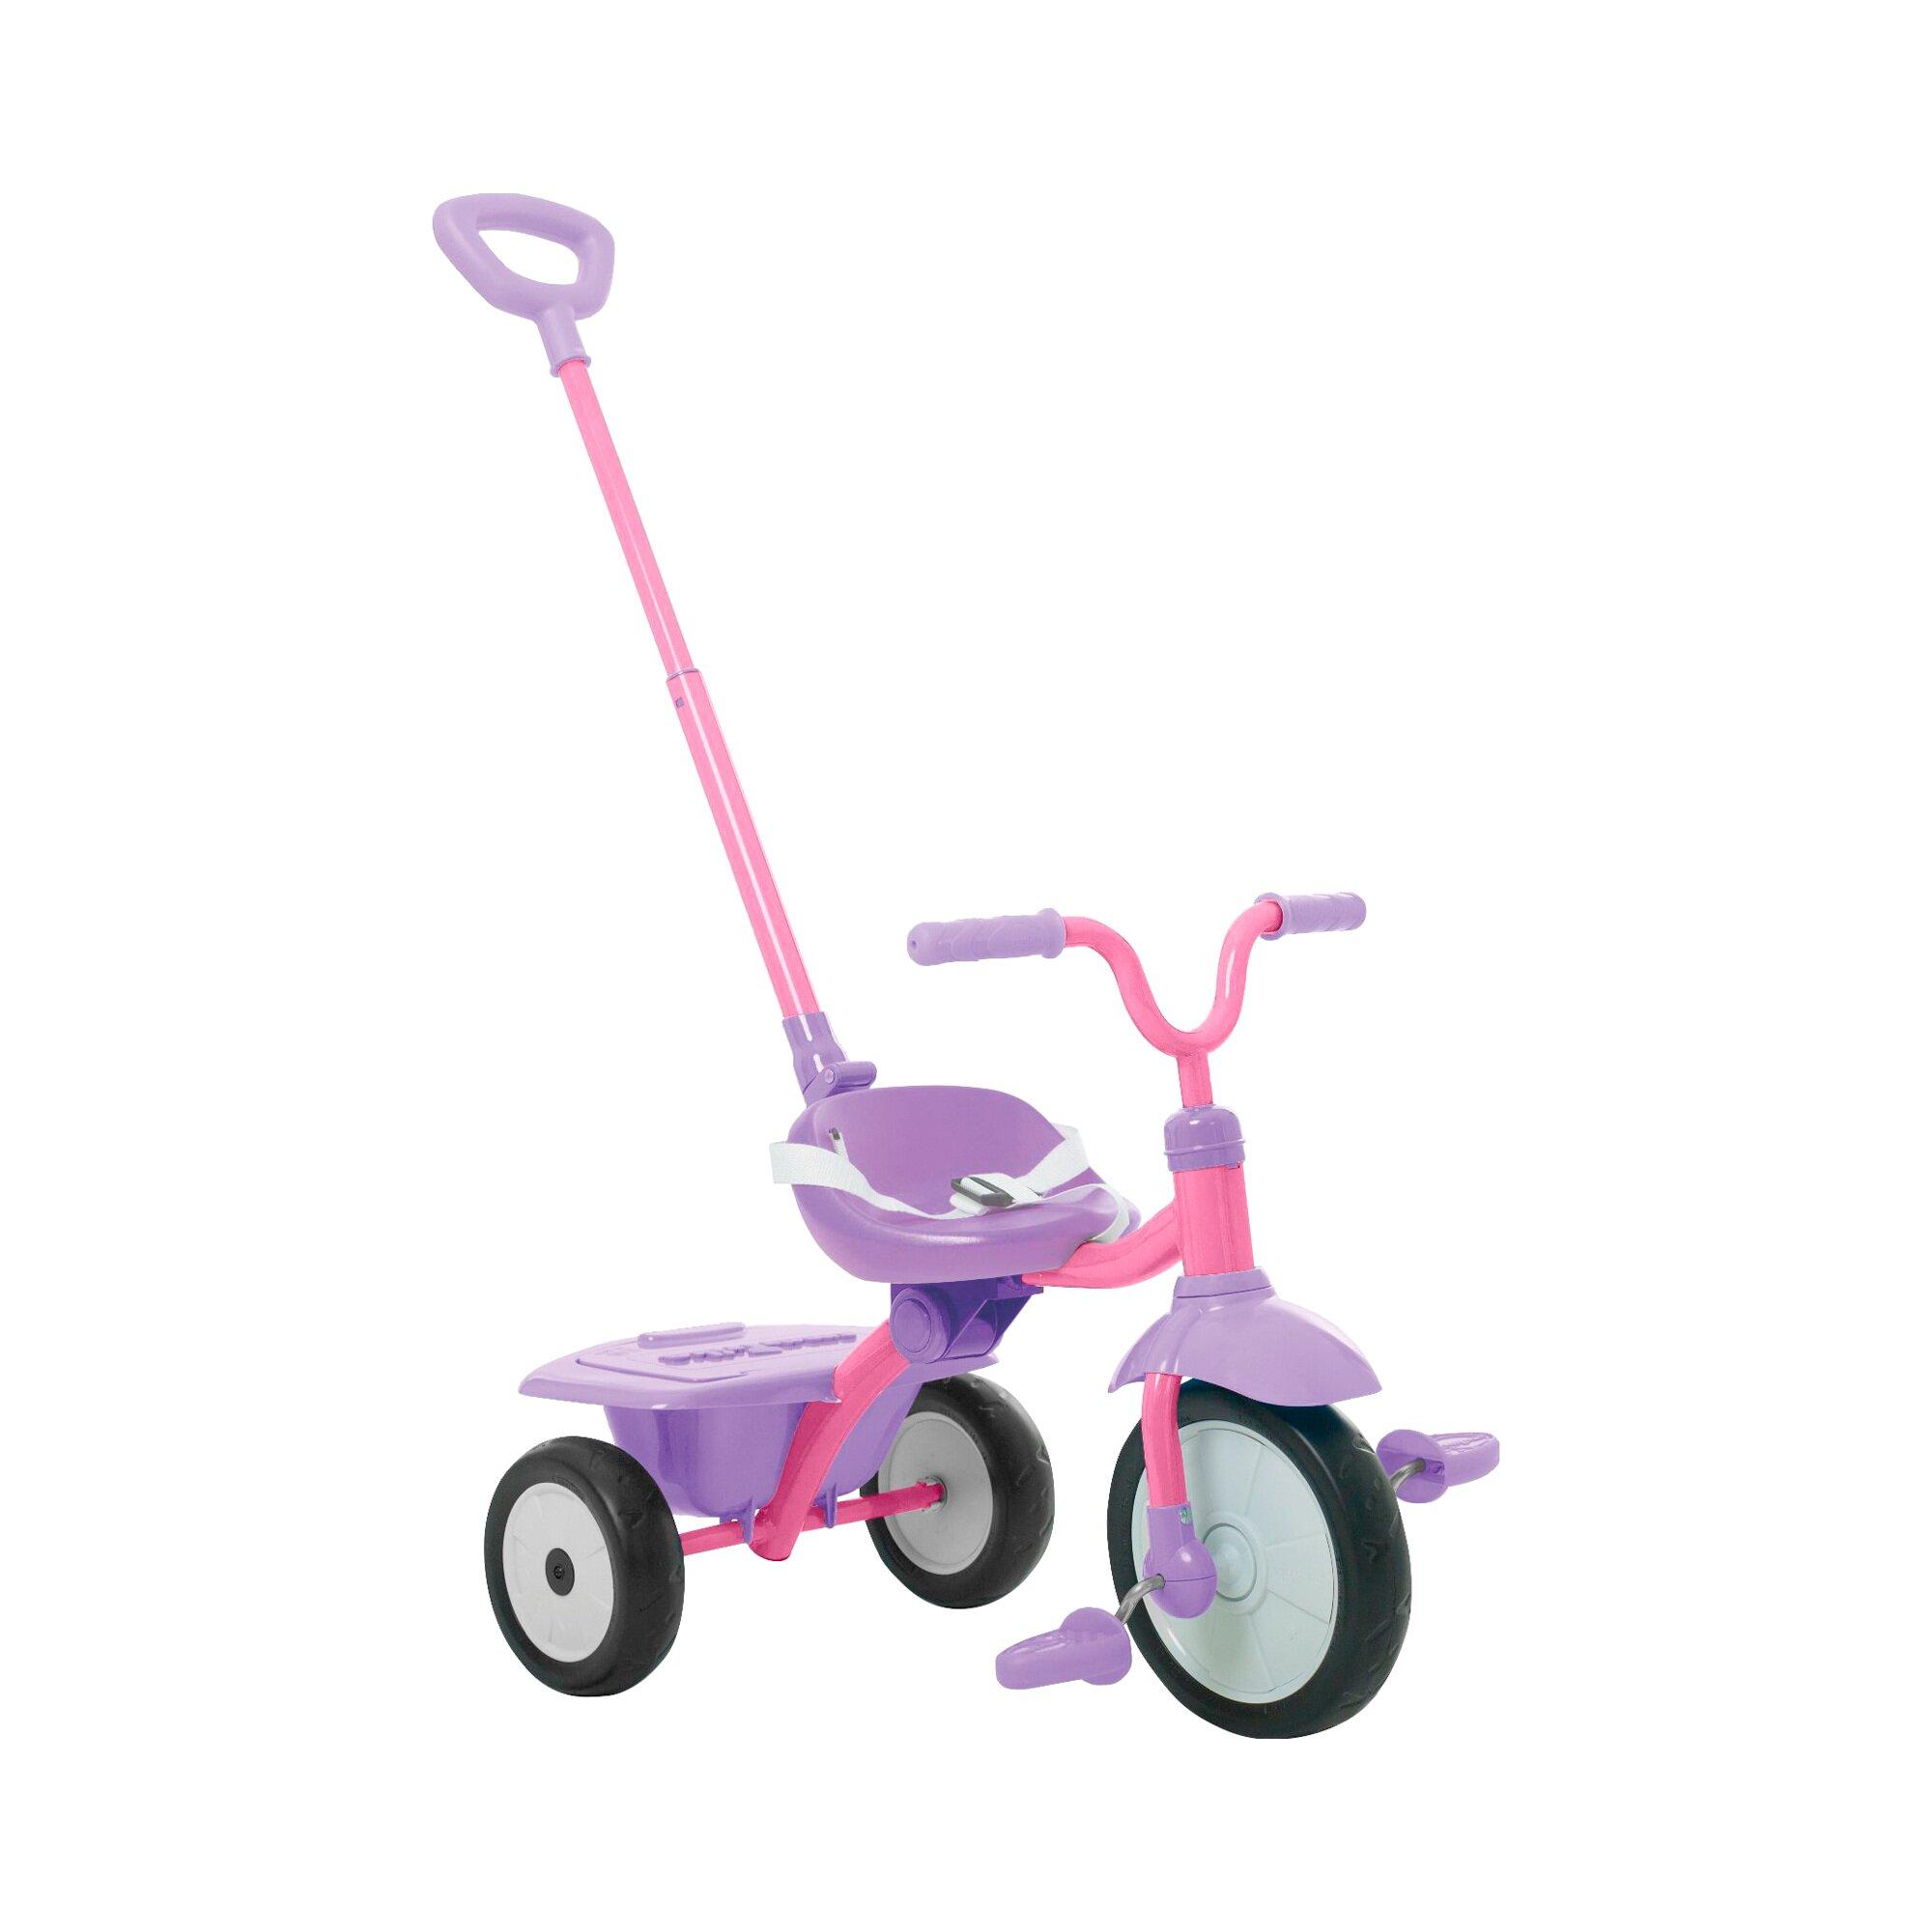 Smartrike Dreirad Folding Fun